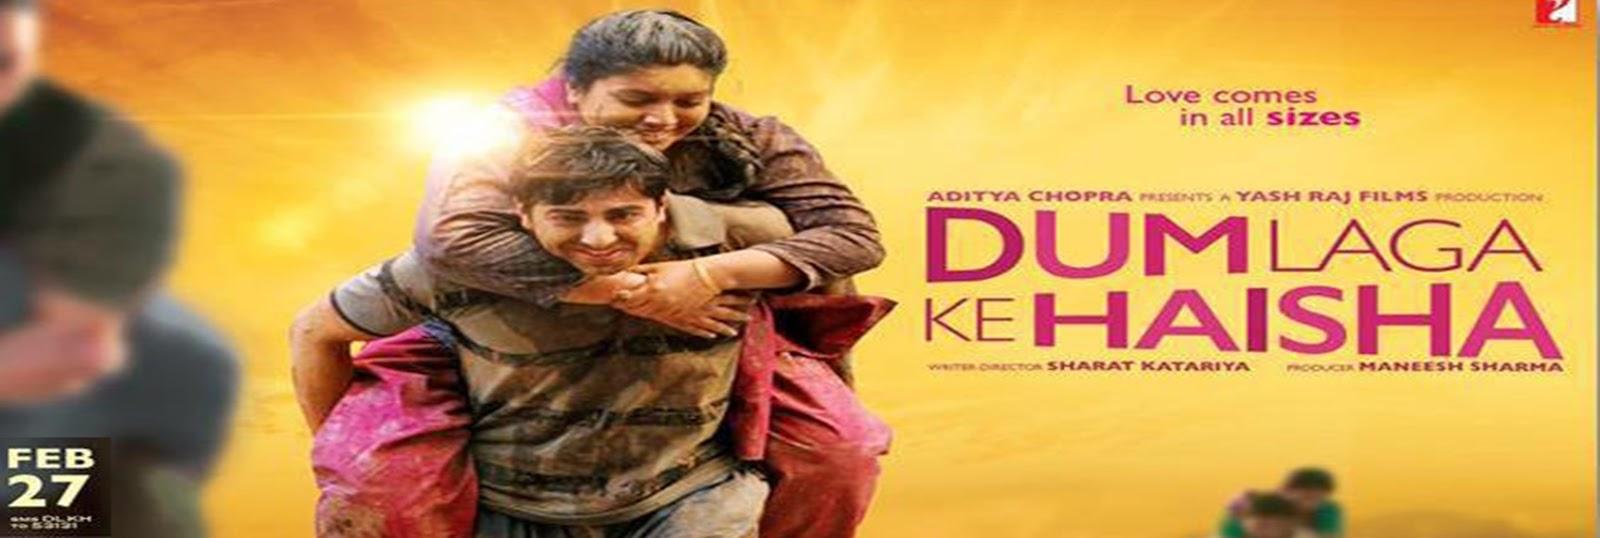 Dum Laga Ke Haisha 2015 Full Movie Hindi 720p - 480p ORG BRRip 450MB - 950MB ESubs Free Download